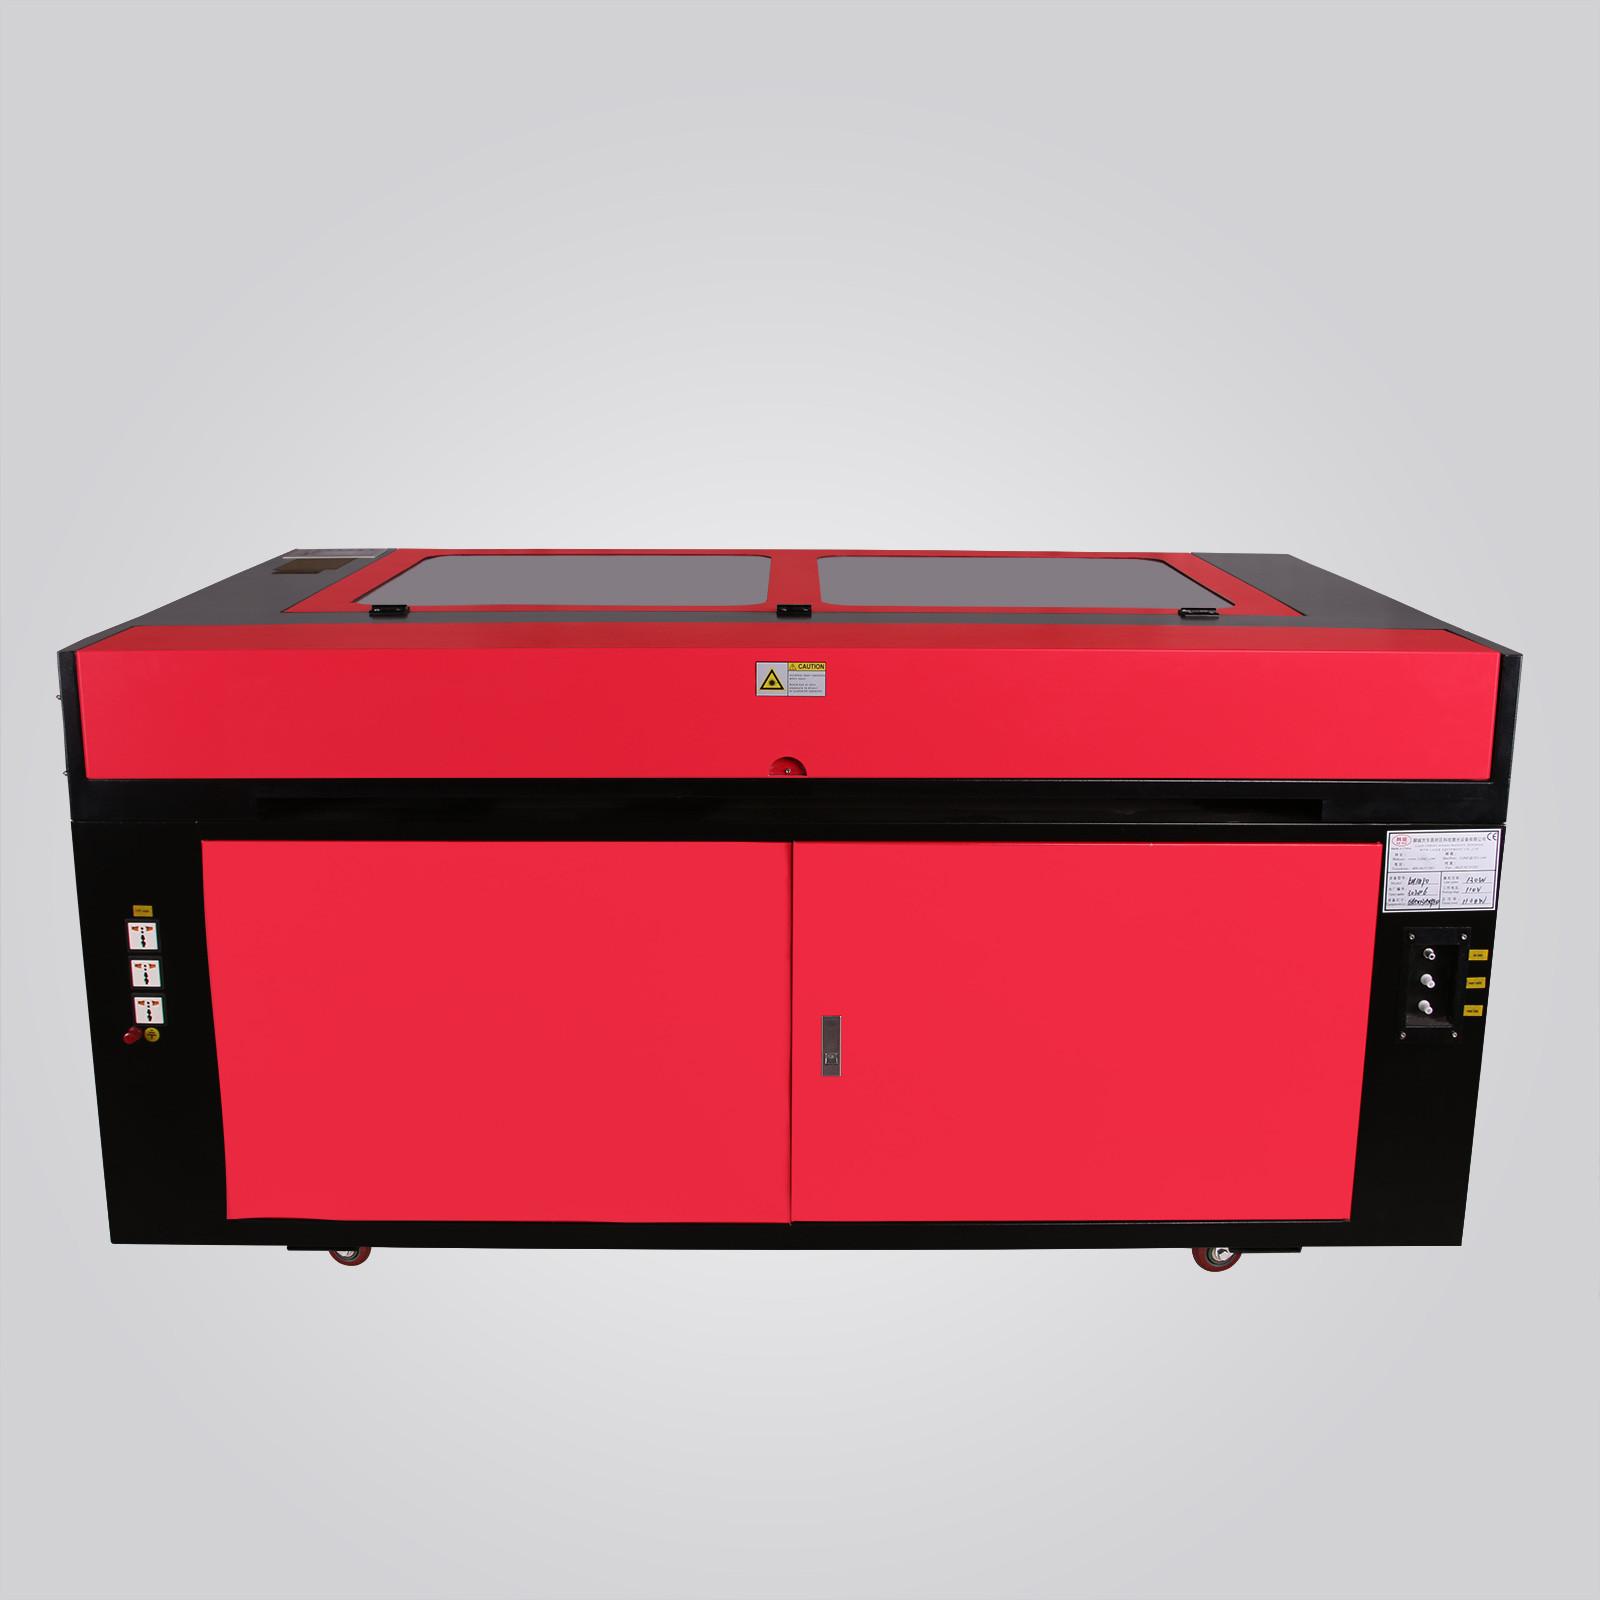 Macchina-per-Incisione-Laser-CO2-40-130W-Asse-Rotante-Tagliatrice-Incisore miniatura 76